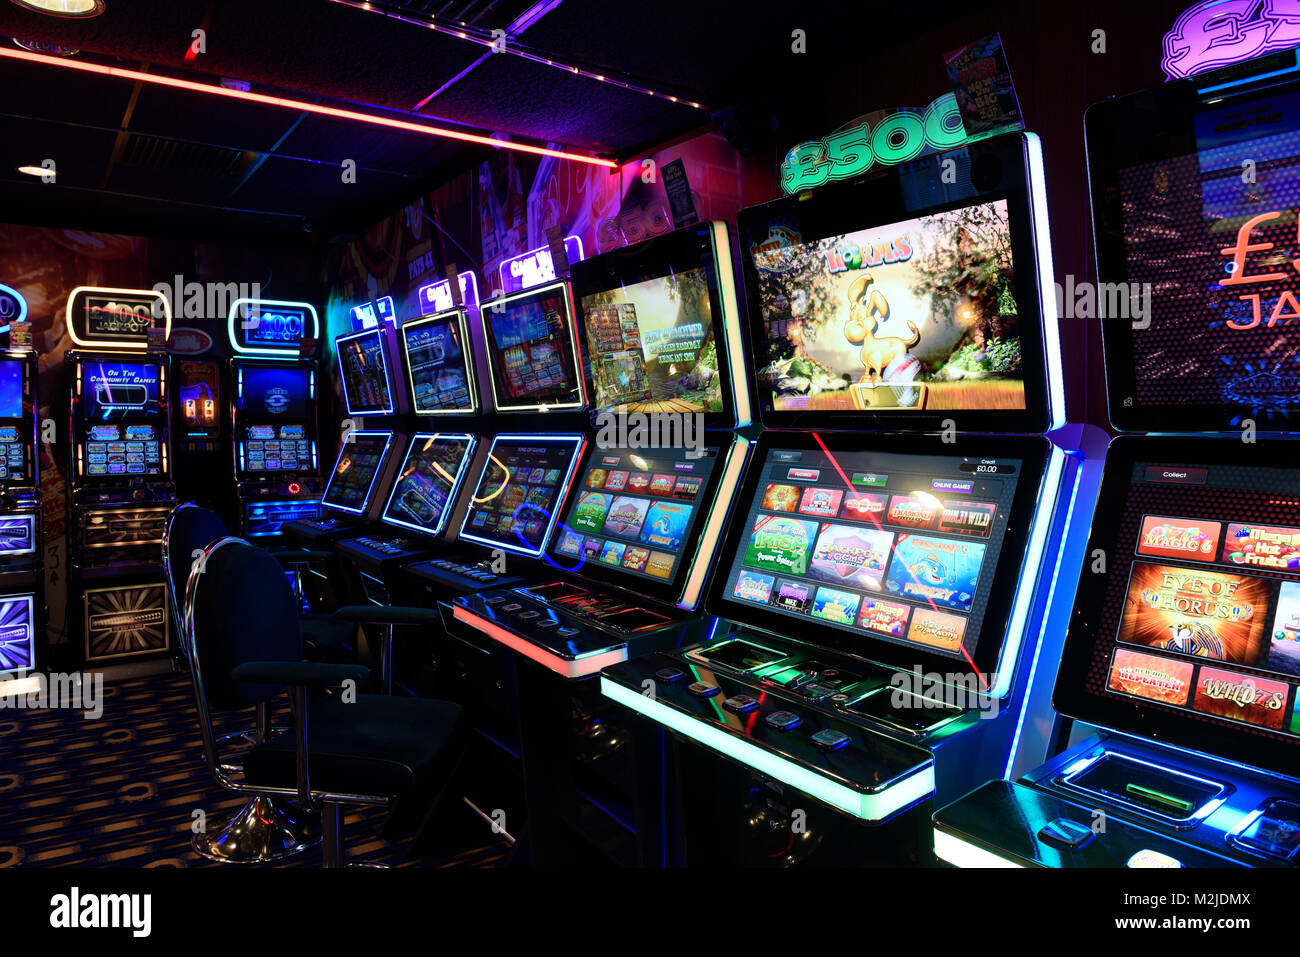 Fruit machines, Fixed Odds Betting Terminals, gambling machines, slot machines in amusement arcade UK - Stock Image